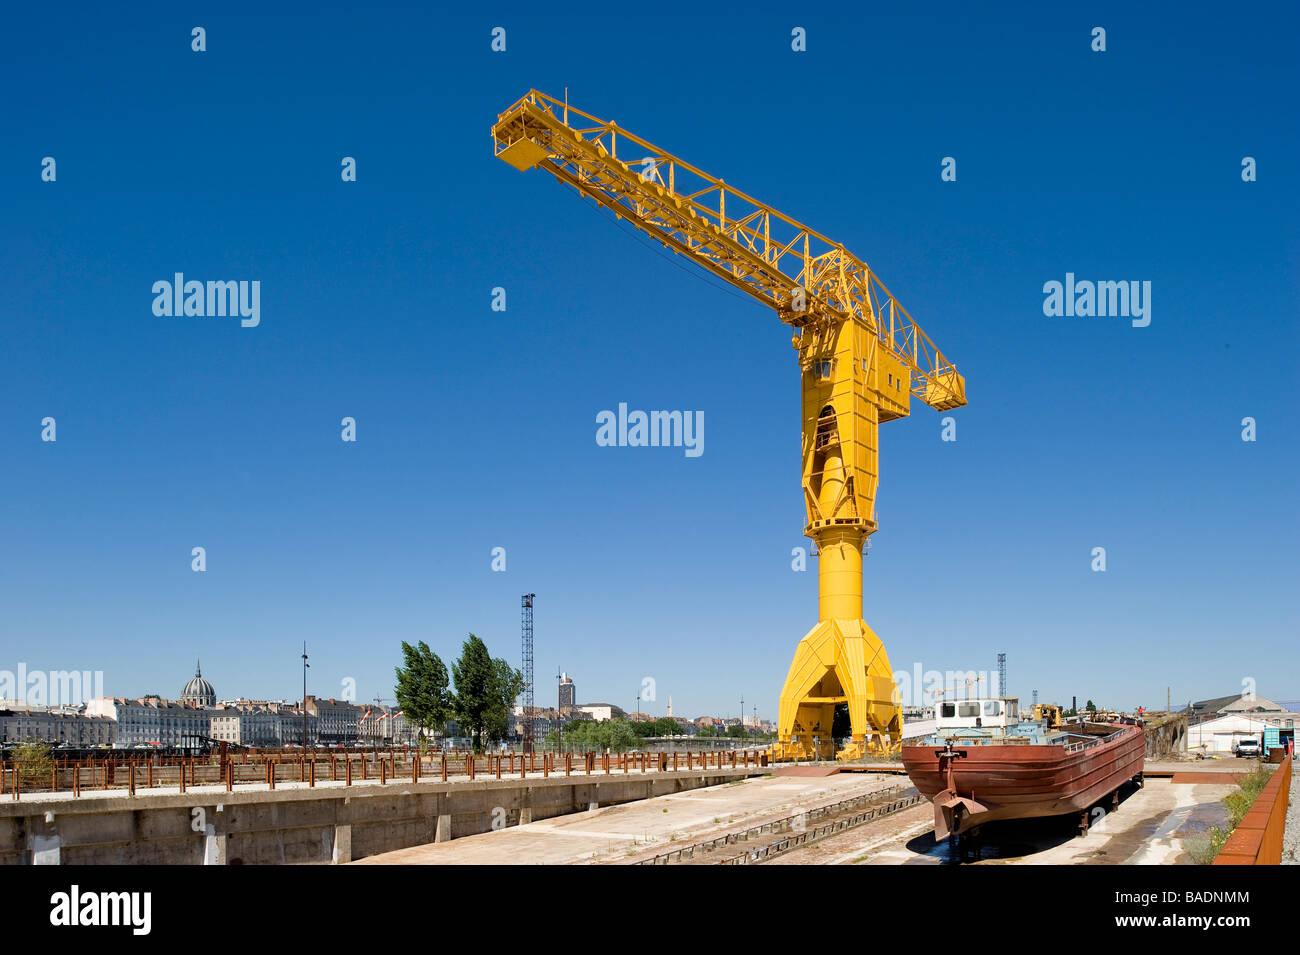 France, Loire Atlantique, Nantes, Isle of Nantes, Titan - Stock Image